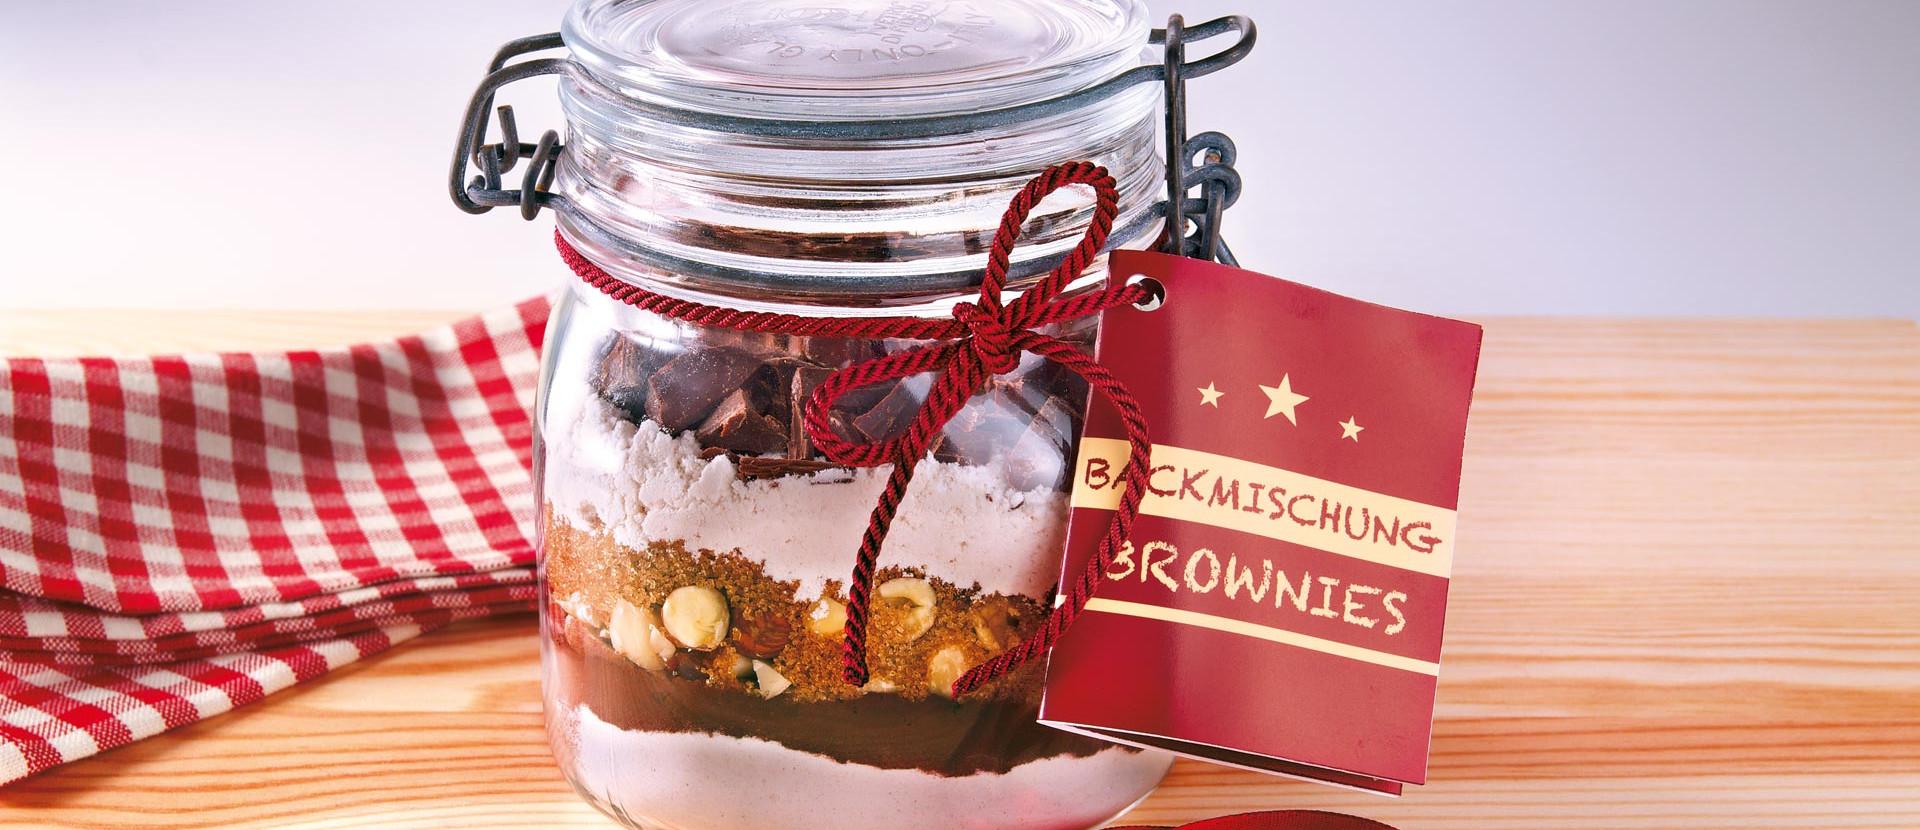 Brownie-Backmischung - fruchtig & nussig